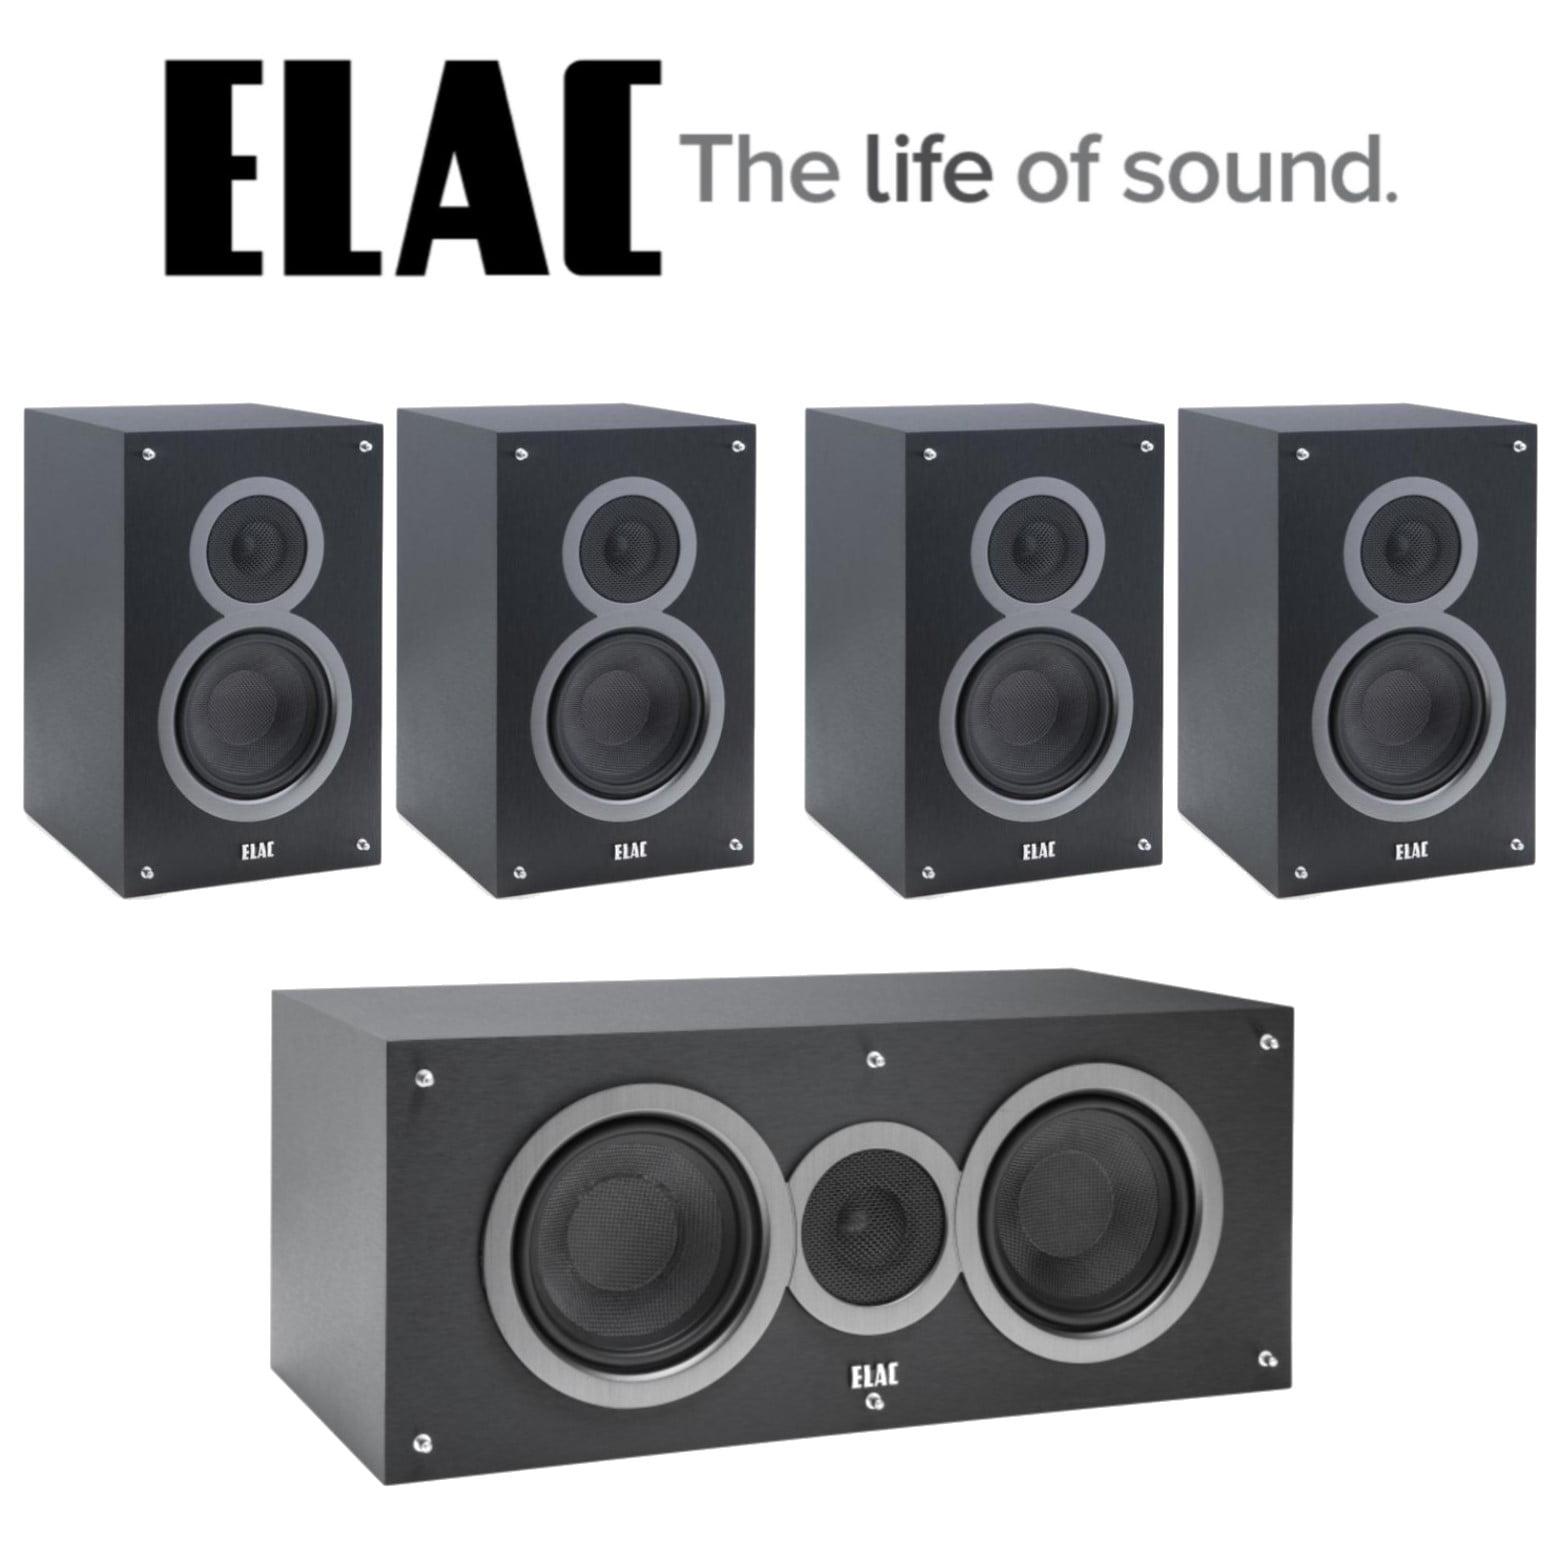 Elac Bundle with (4) Debut B5 Bookshelf Speakers and (1) Debut C5 Center Channel Speaker